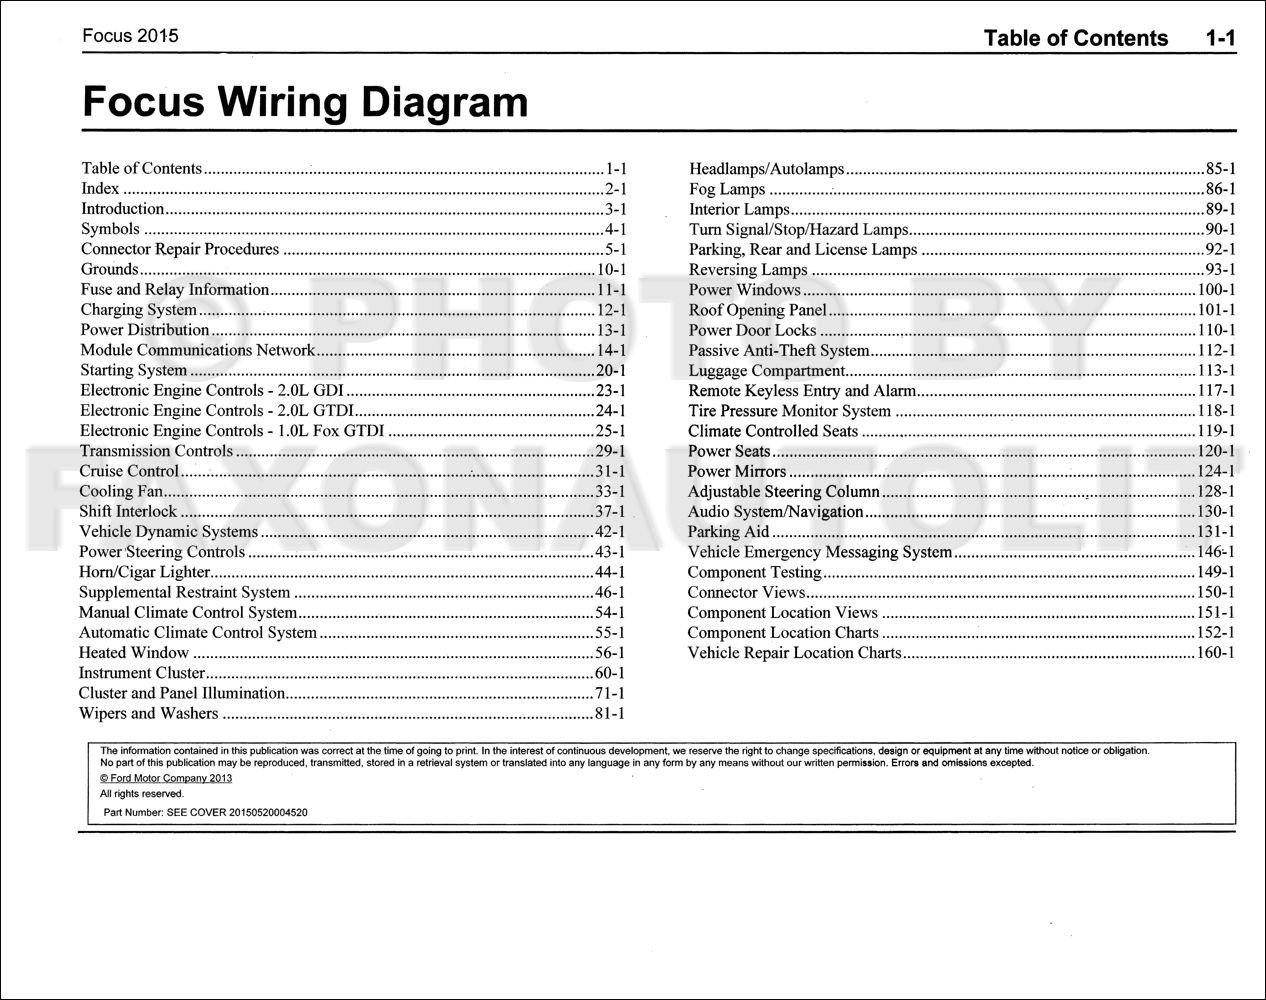 1931 ford wiring diagram nissan x trail t30 2015 focus manual original